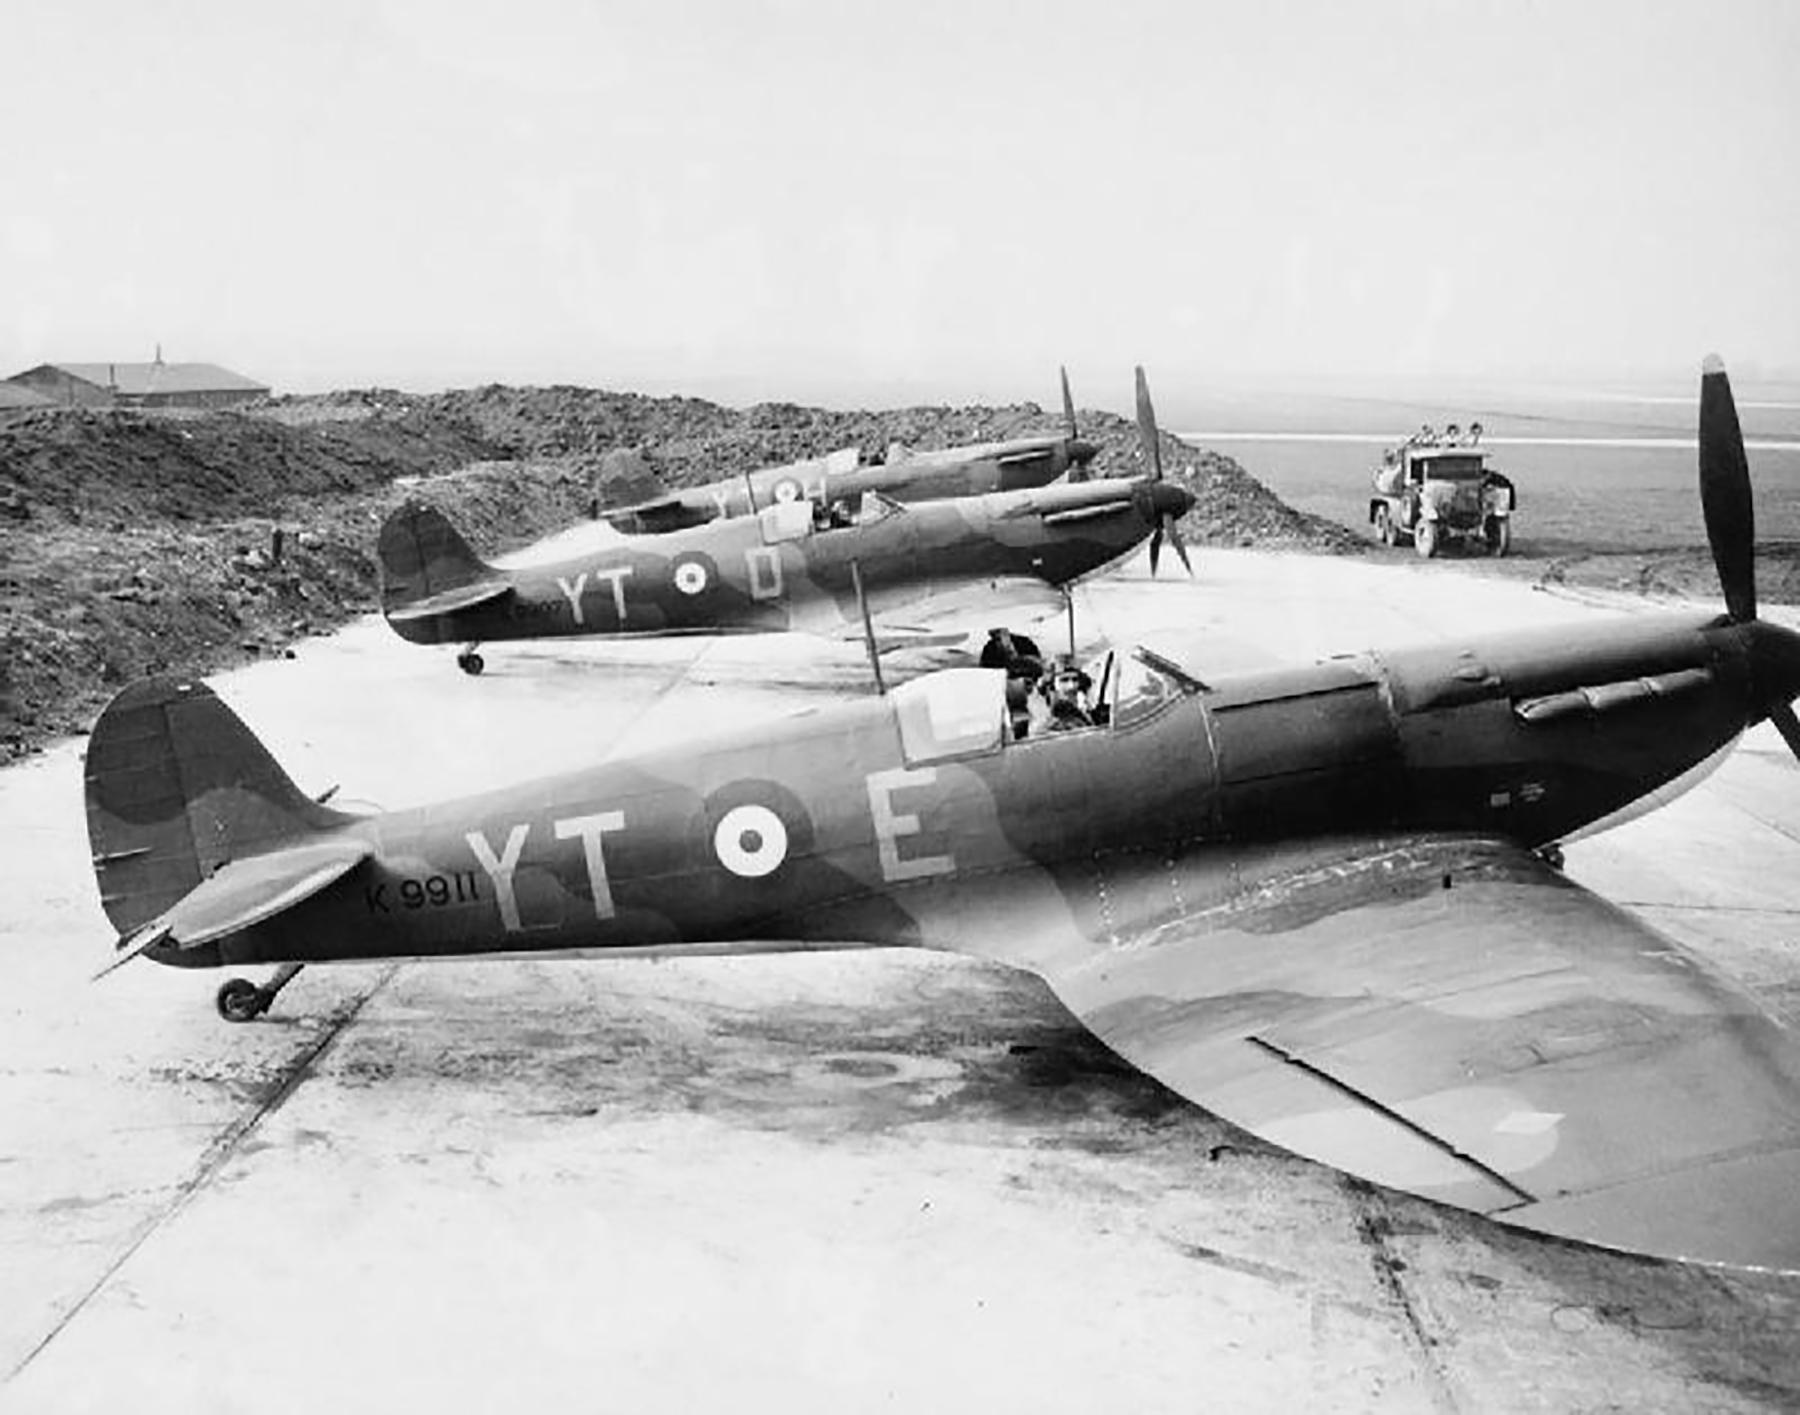 Spitfire MkIa RAF 65Sqn YTE K9911 sd by Bf 109 Dover Sgt Kirton KIA 8th Aug 1939 01